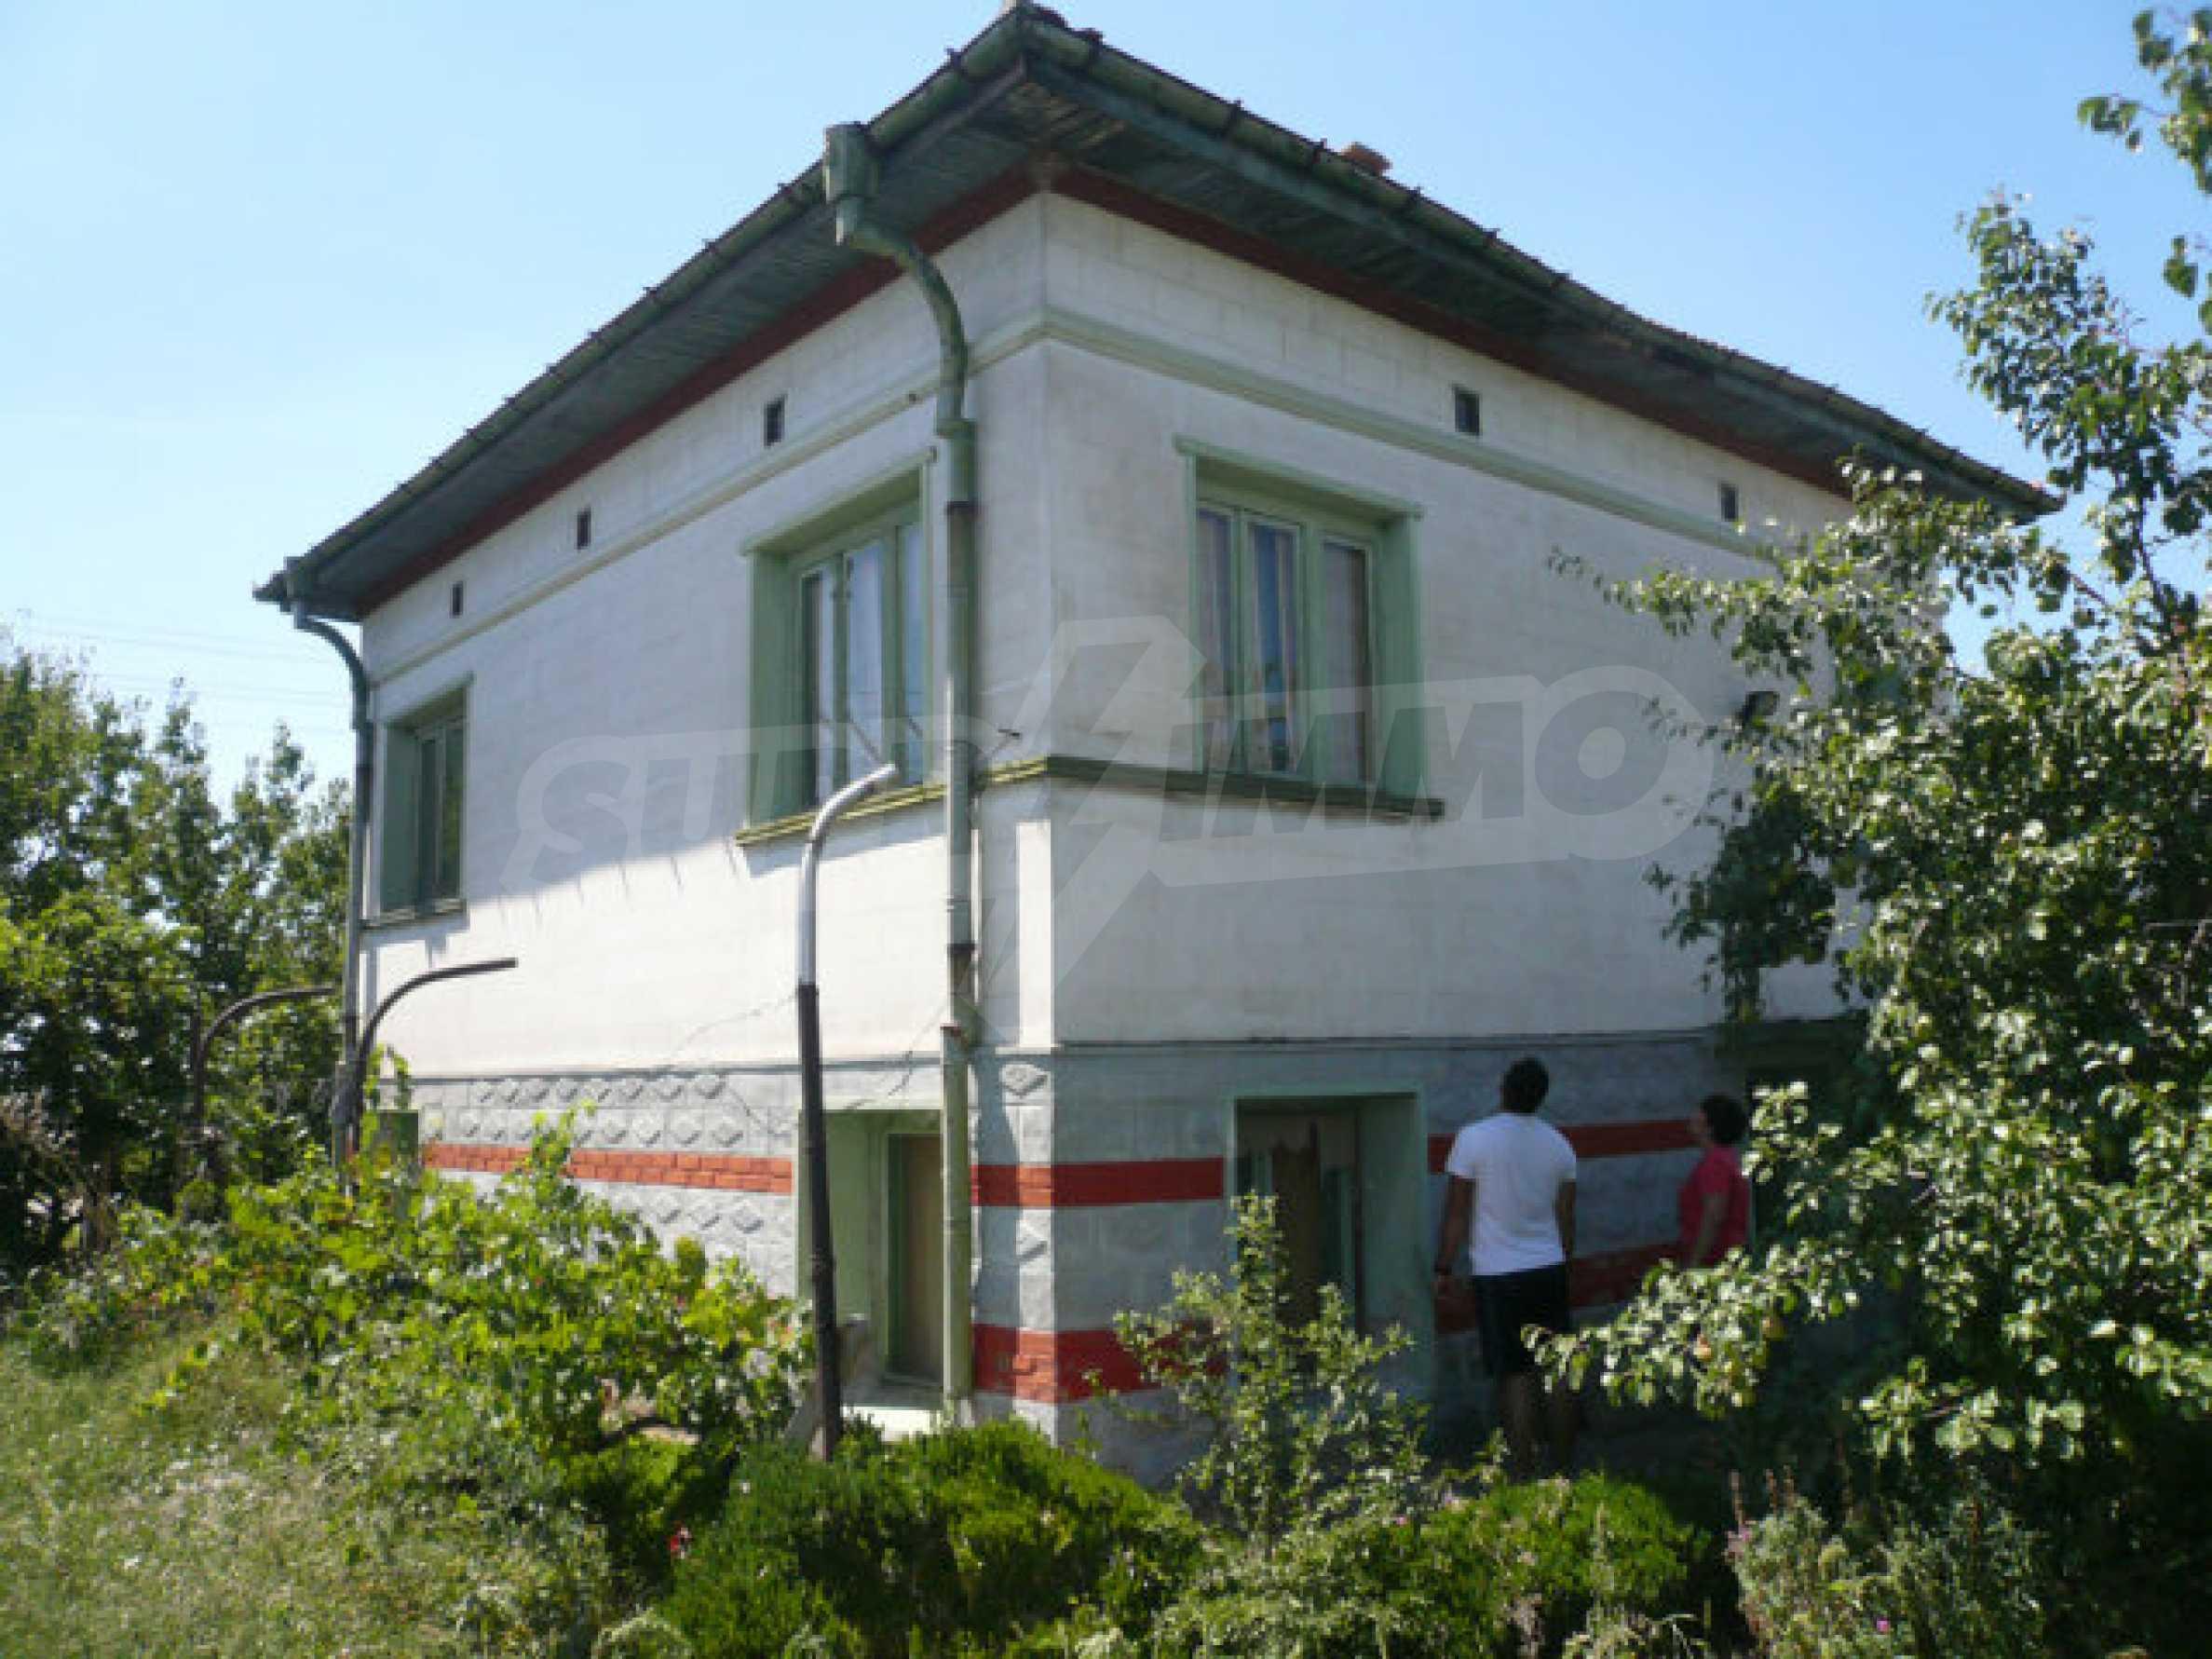 Big rural two-storey house on the Danube river near Vidin